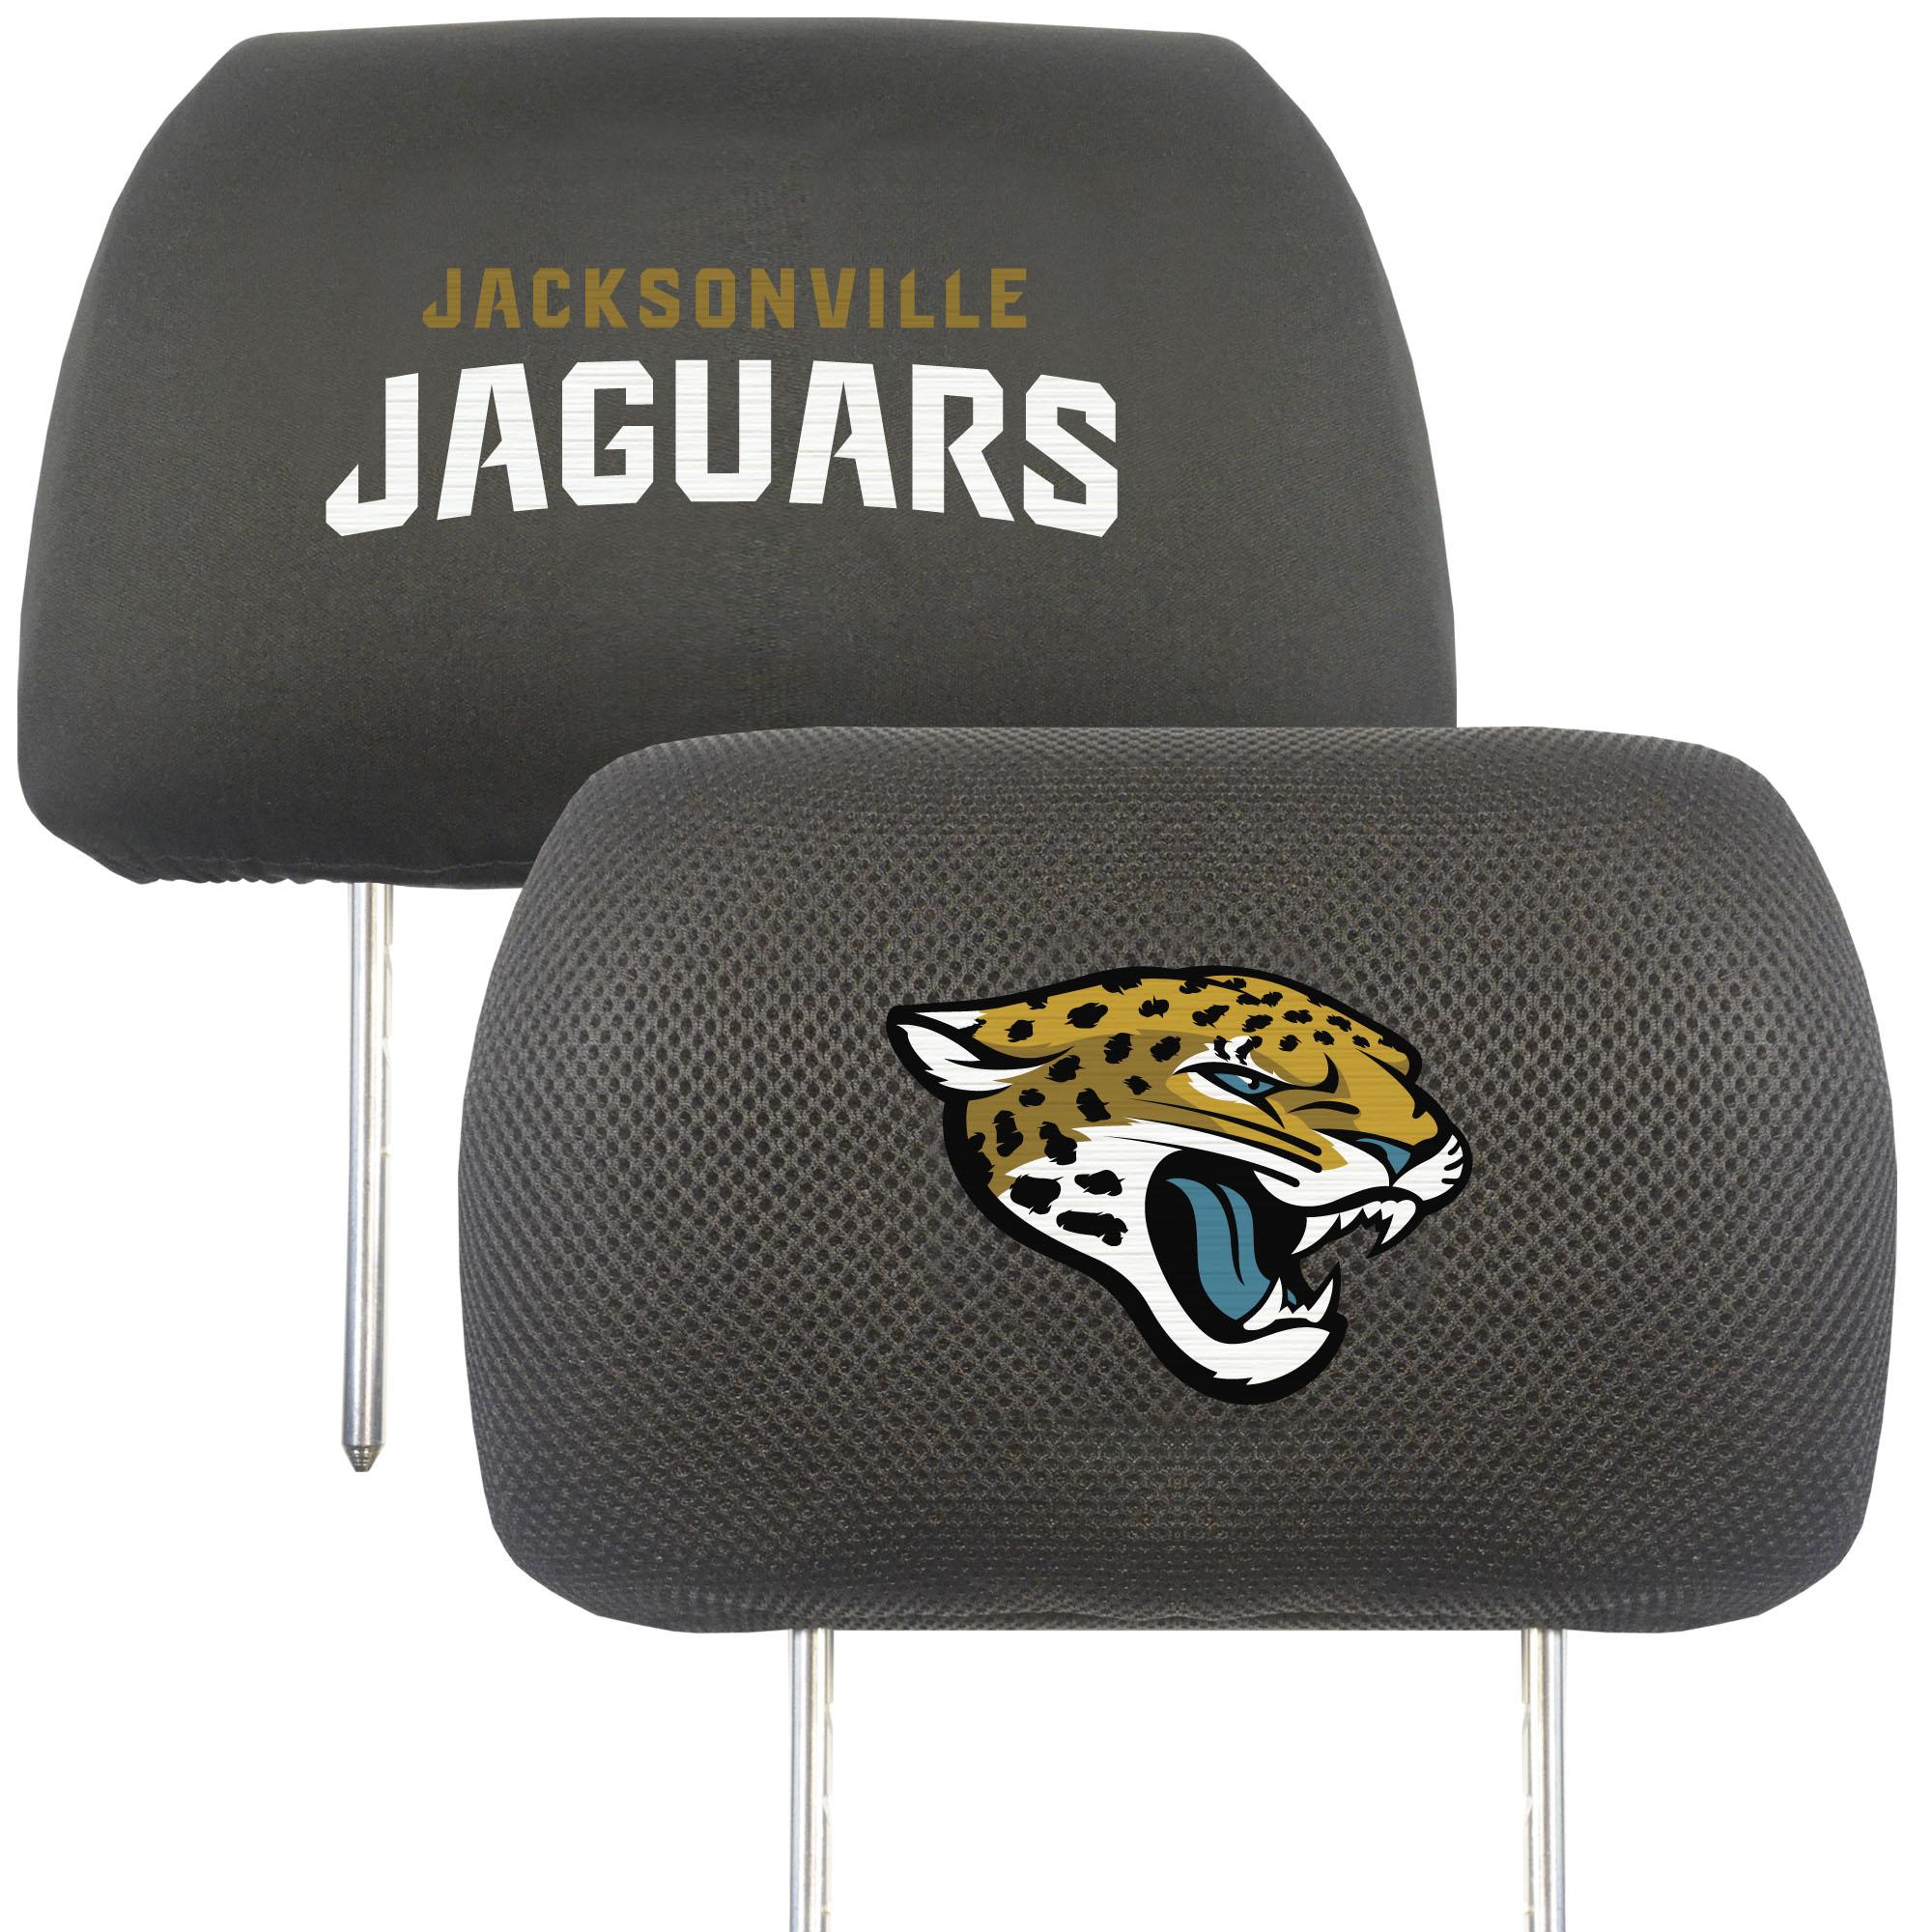 Jacksonville Jaguars Head Rest Cover